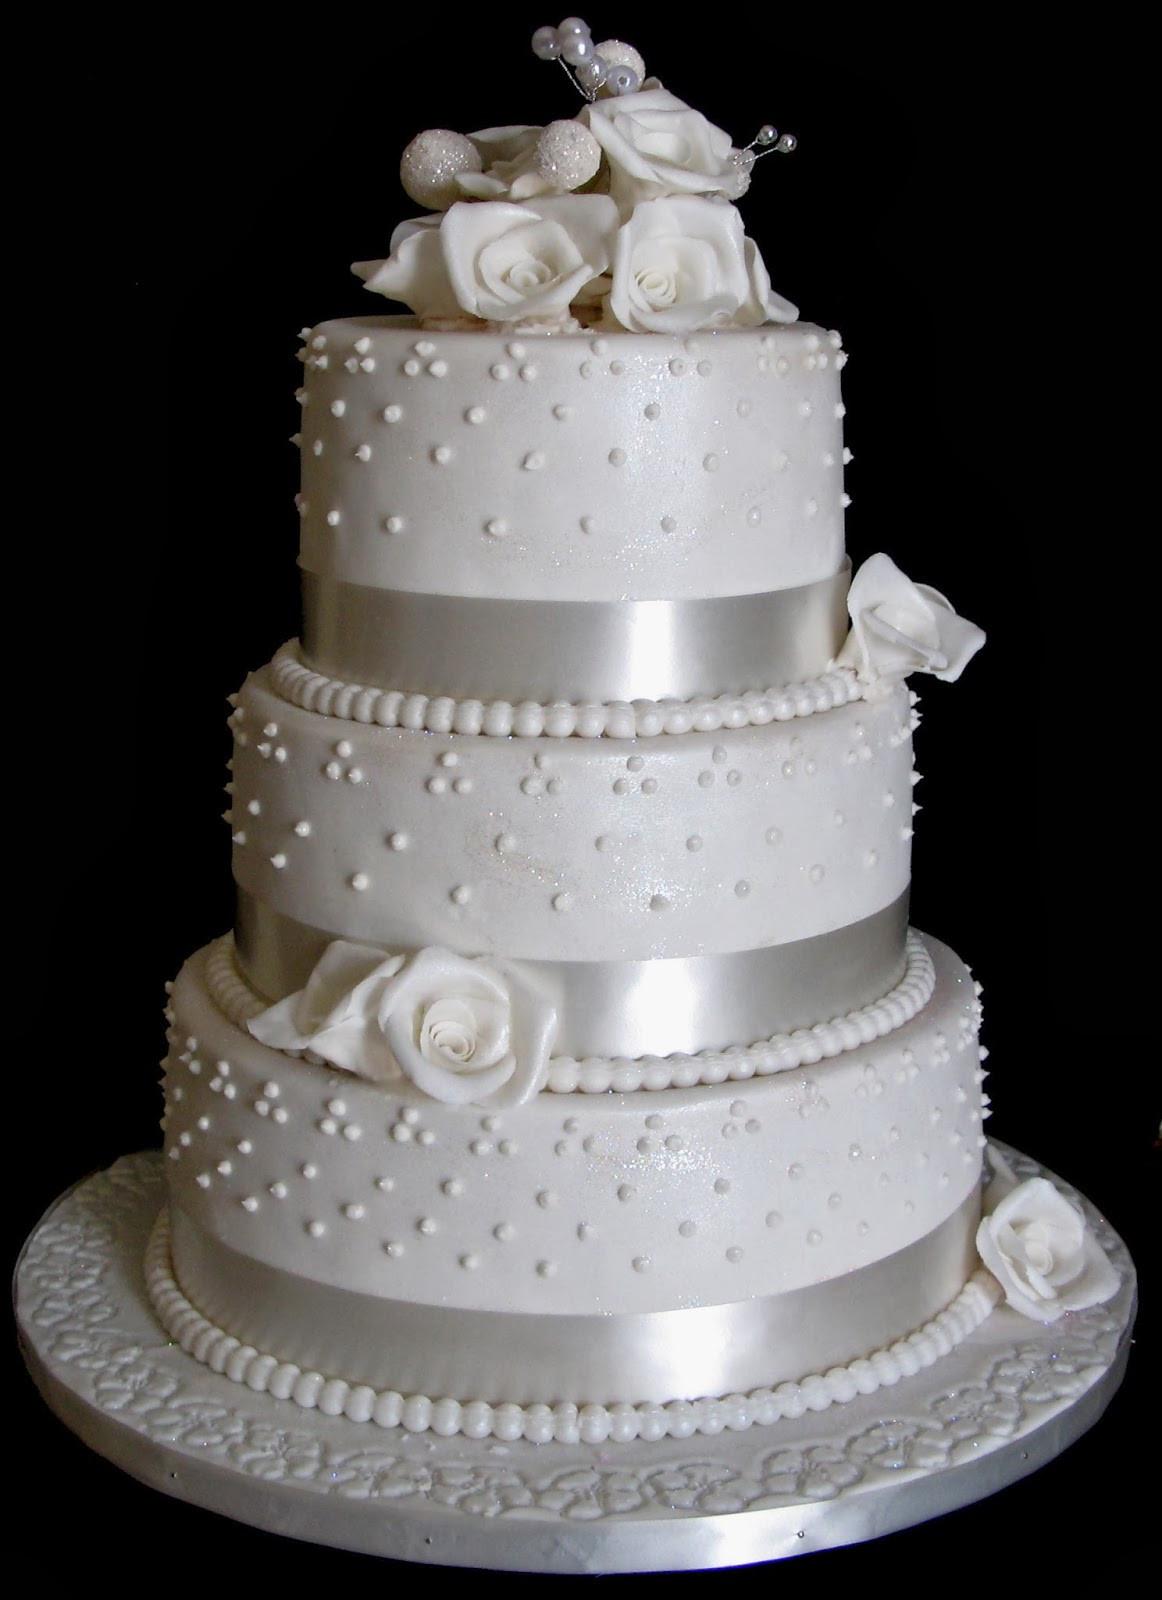 Two Layered Wedding Cakes  3 layered wedding cake idea in 2017